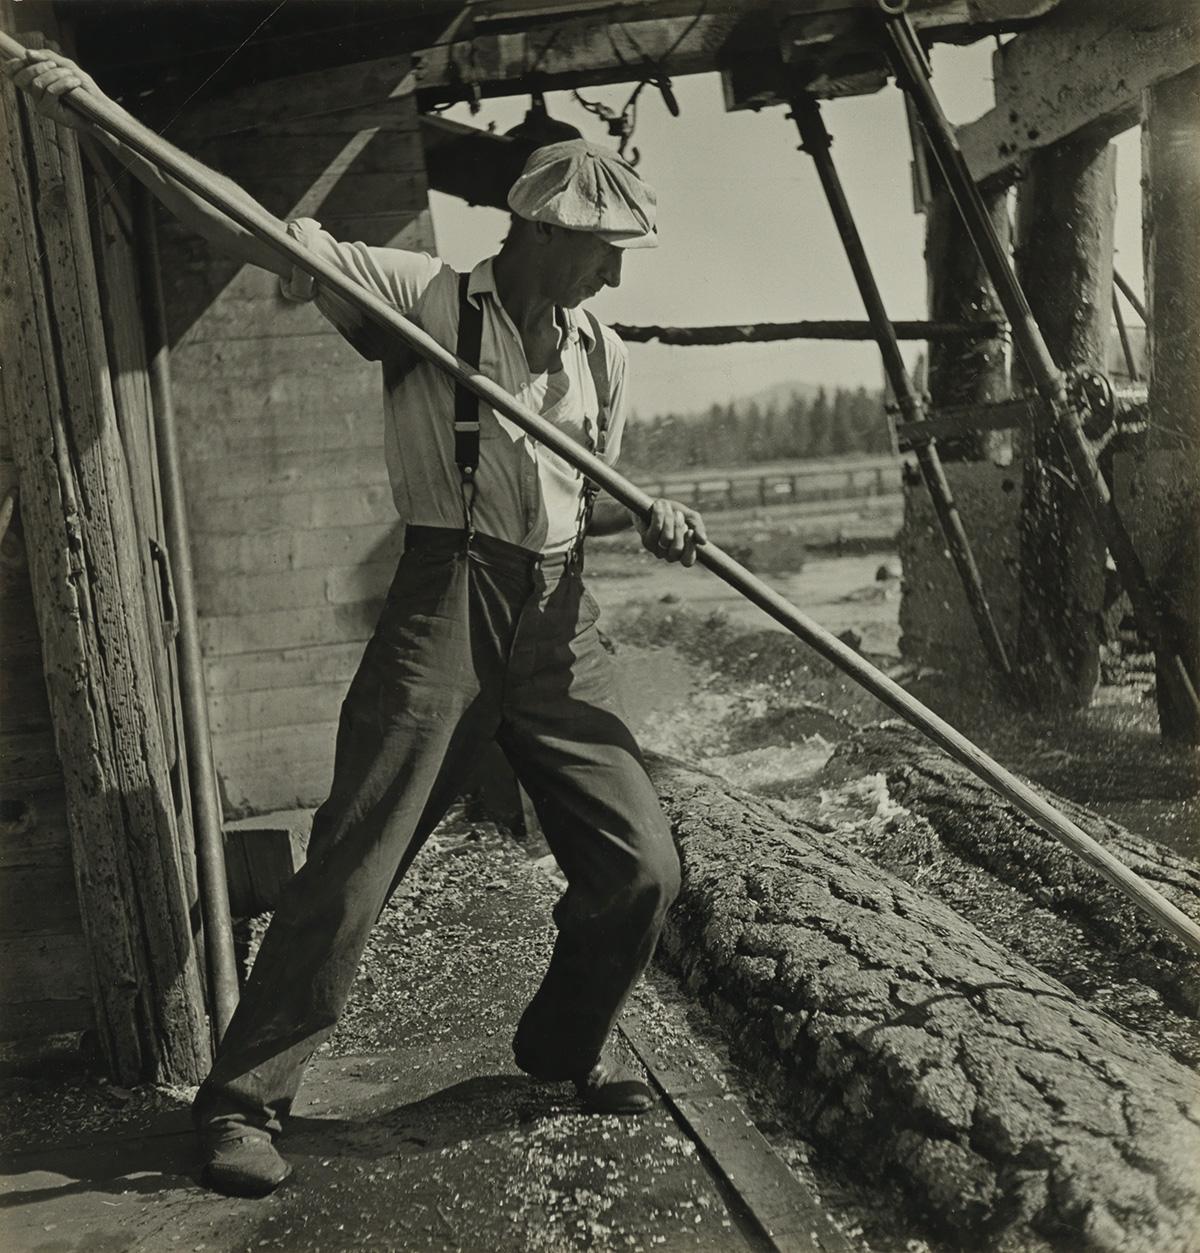 BERENICE ABBOTT (1898-1991) Red River logging company, California.